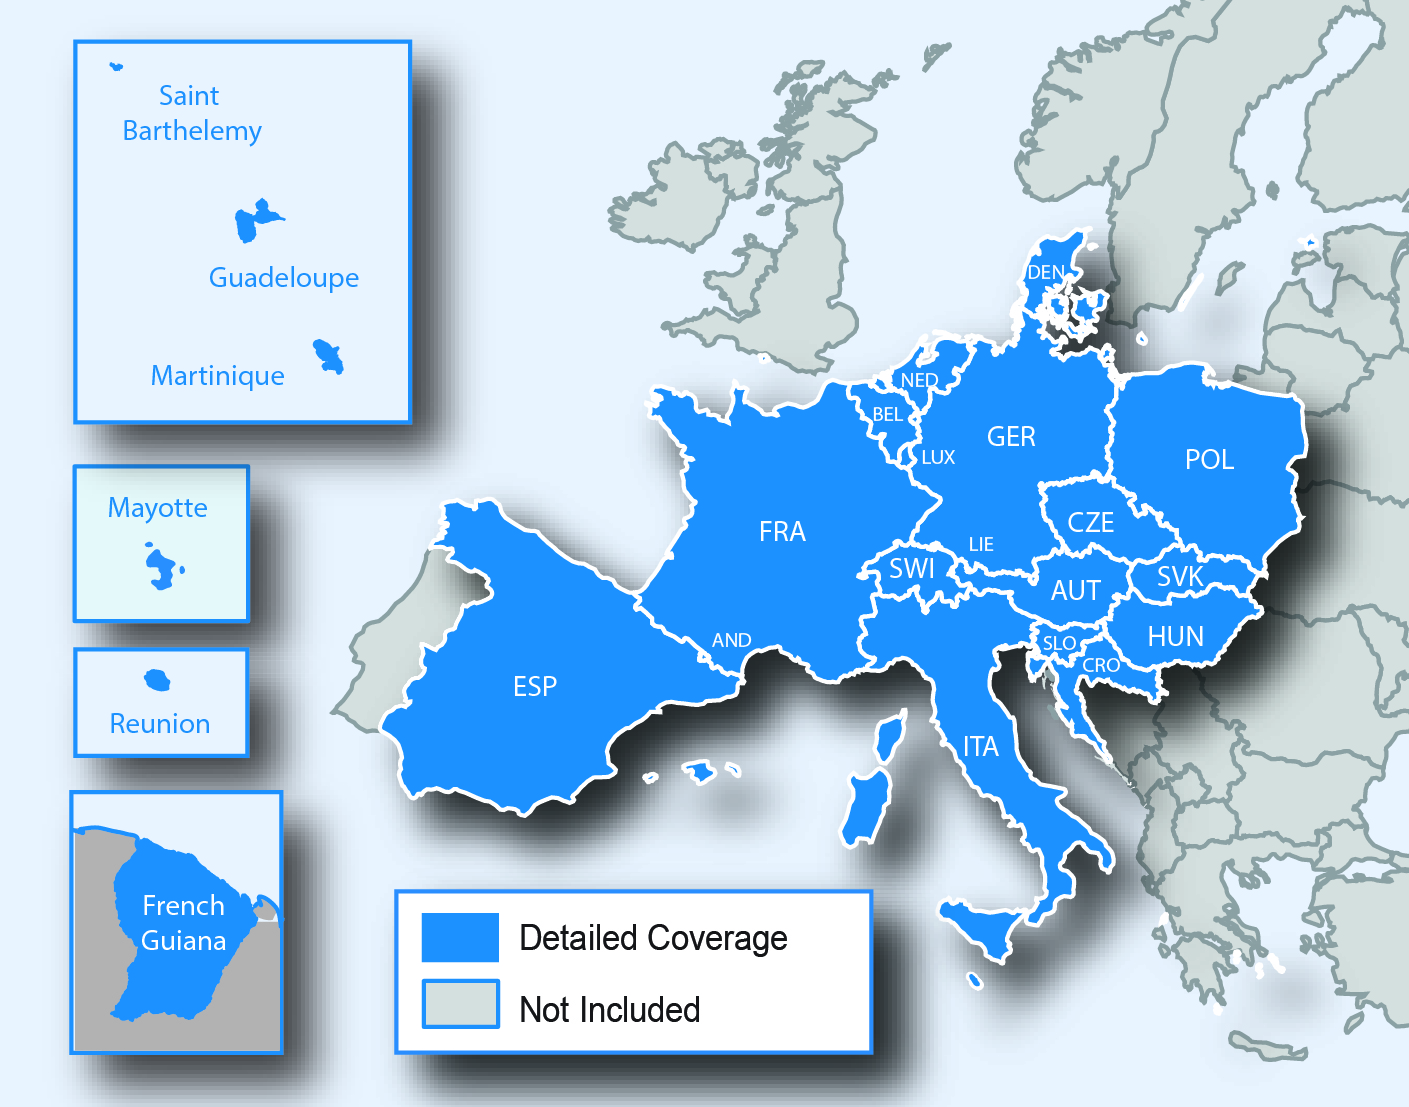 Preloaded Maps en-GB | Garmin | United Kingdom on map of central america, world map central america, large map central america, large map of latin america,